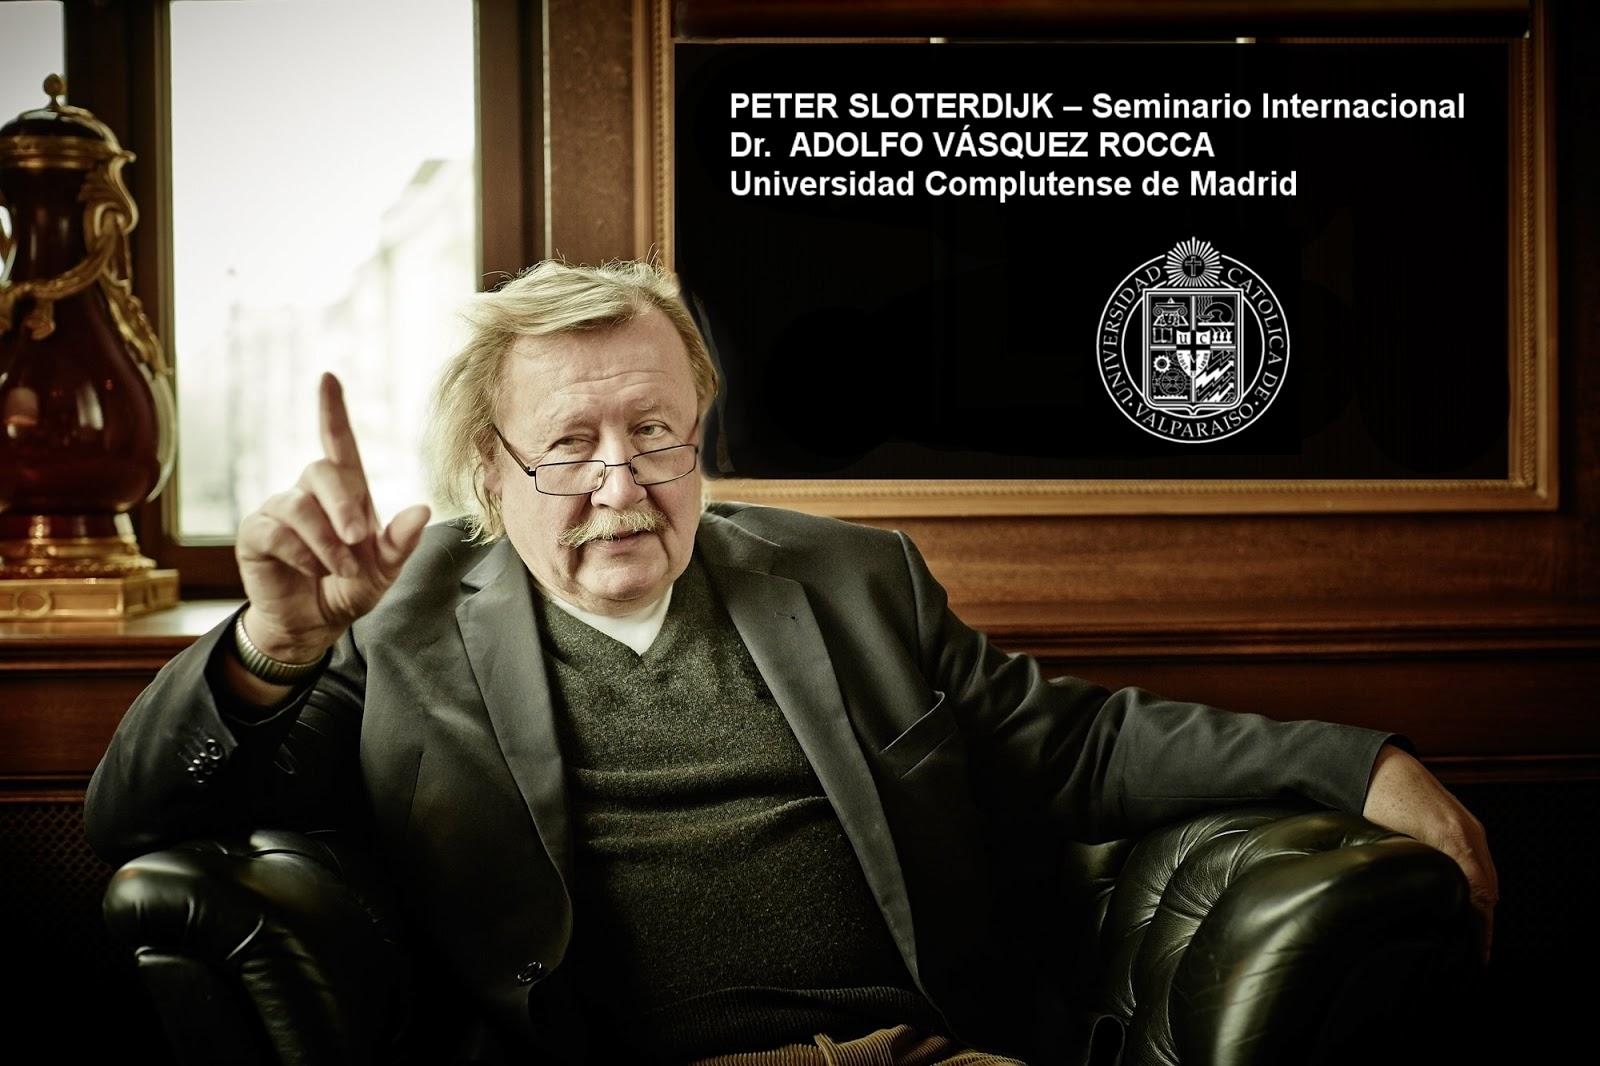 http://2.bp.blogspot.com/-ia8Q0caTS7Y/UXQxjs62DJI/AAAAAAAAHI0/QWws15SPyN0/s1600/SLOTERDIJK+_+Peter+_+Por+_+Adolfo+Vasquez+Rocca+_+Esferas+_+Seminario+Afiche+_+7000++.jpg